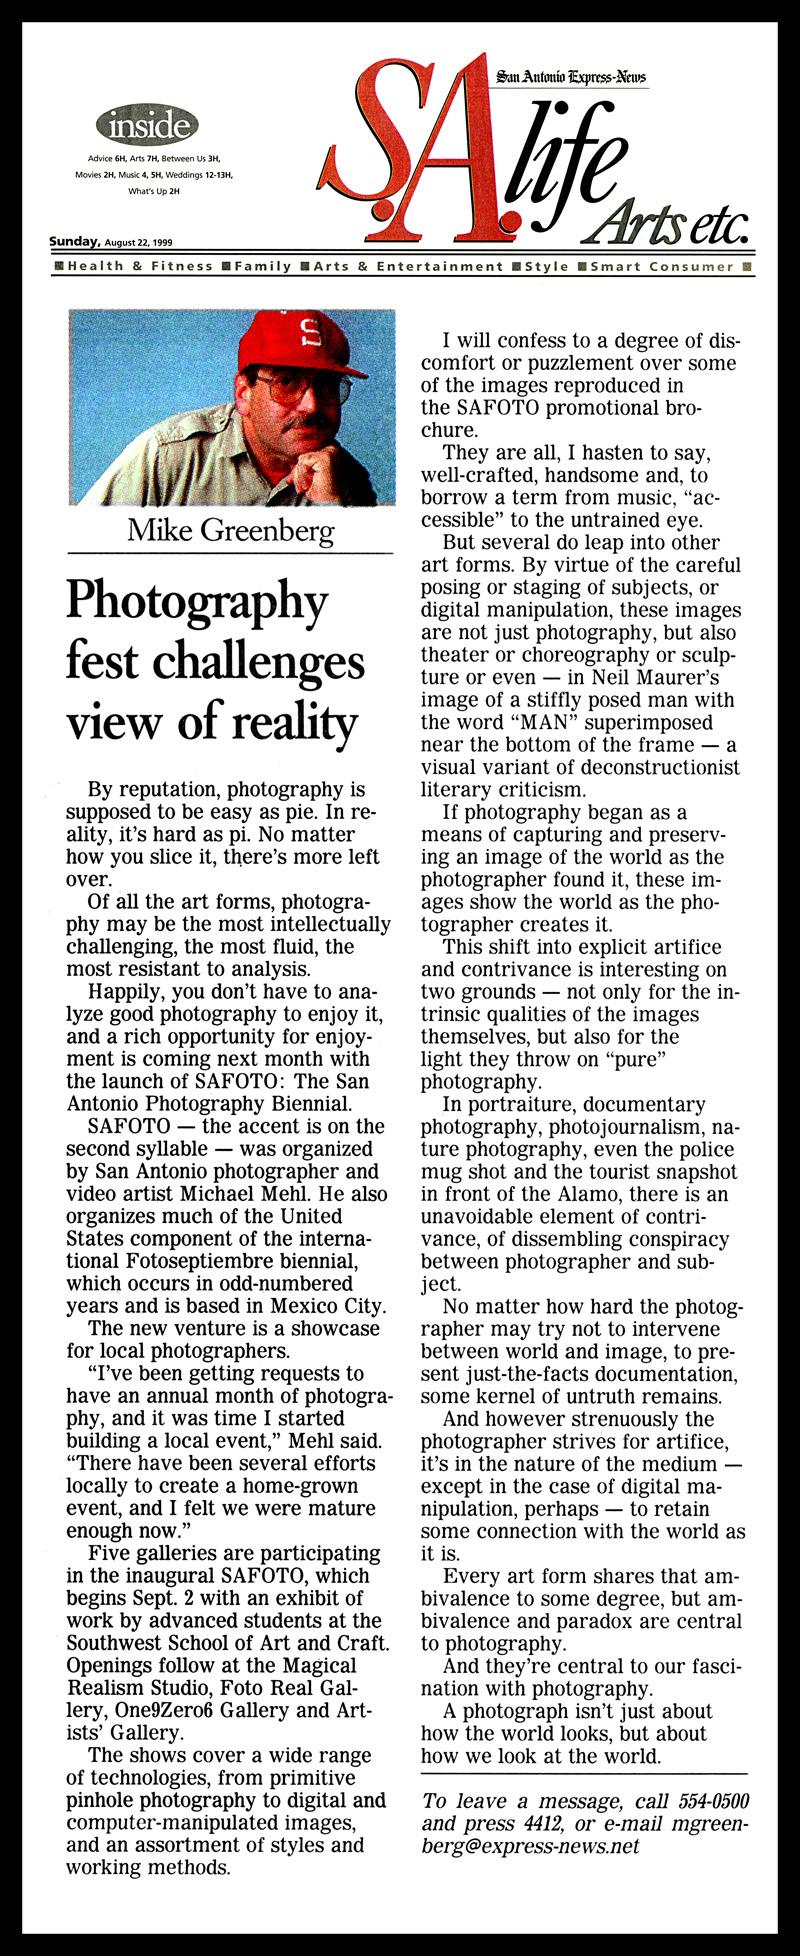 1999_Michael-Mehl_SAFOTO_Mike-Greenberg-Column_San-Antonio-Express-News